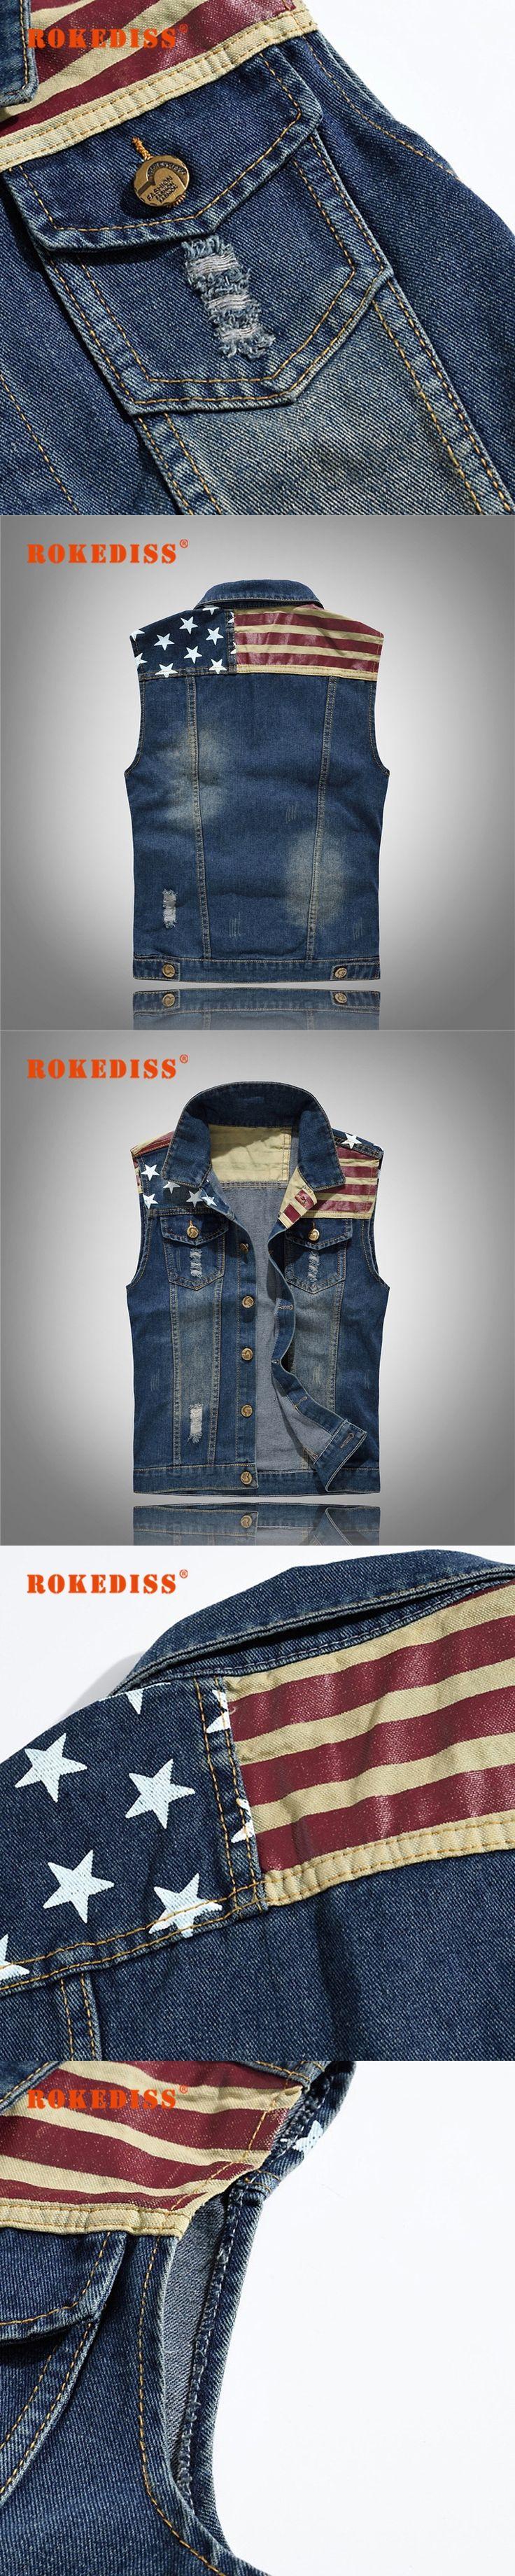 2017 New Ripped Jeans Vest Men America Flag Blue Jean Waistcoat Sleeveless Cowboy Jeans Jacket Men  M-5XL G298